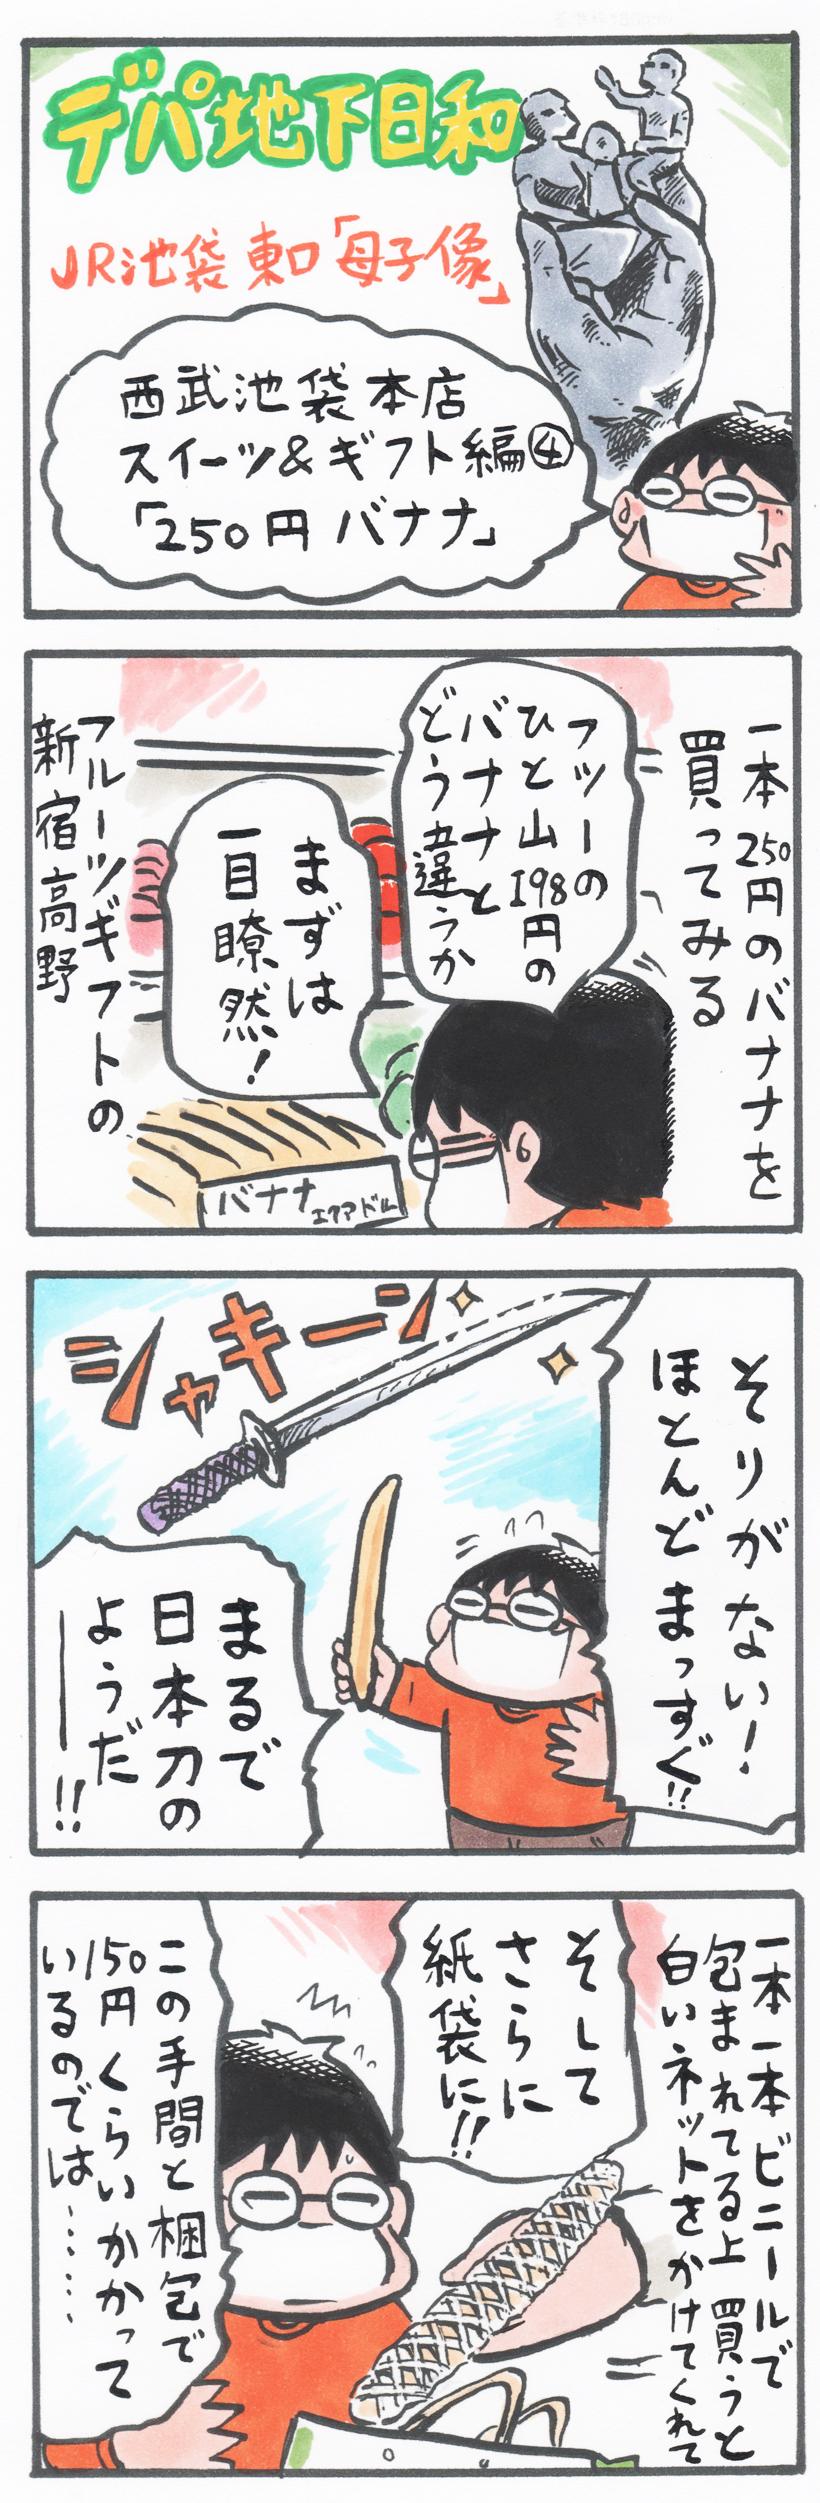 20160512_01